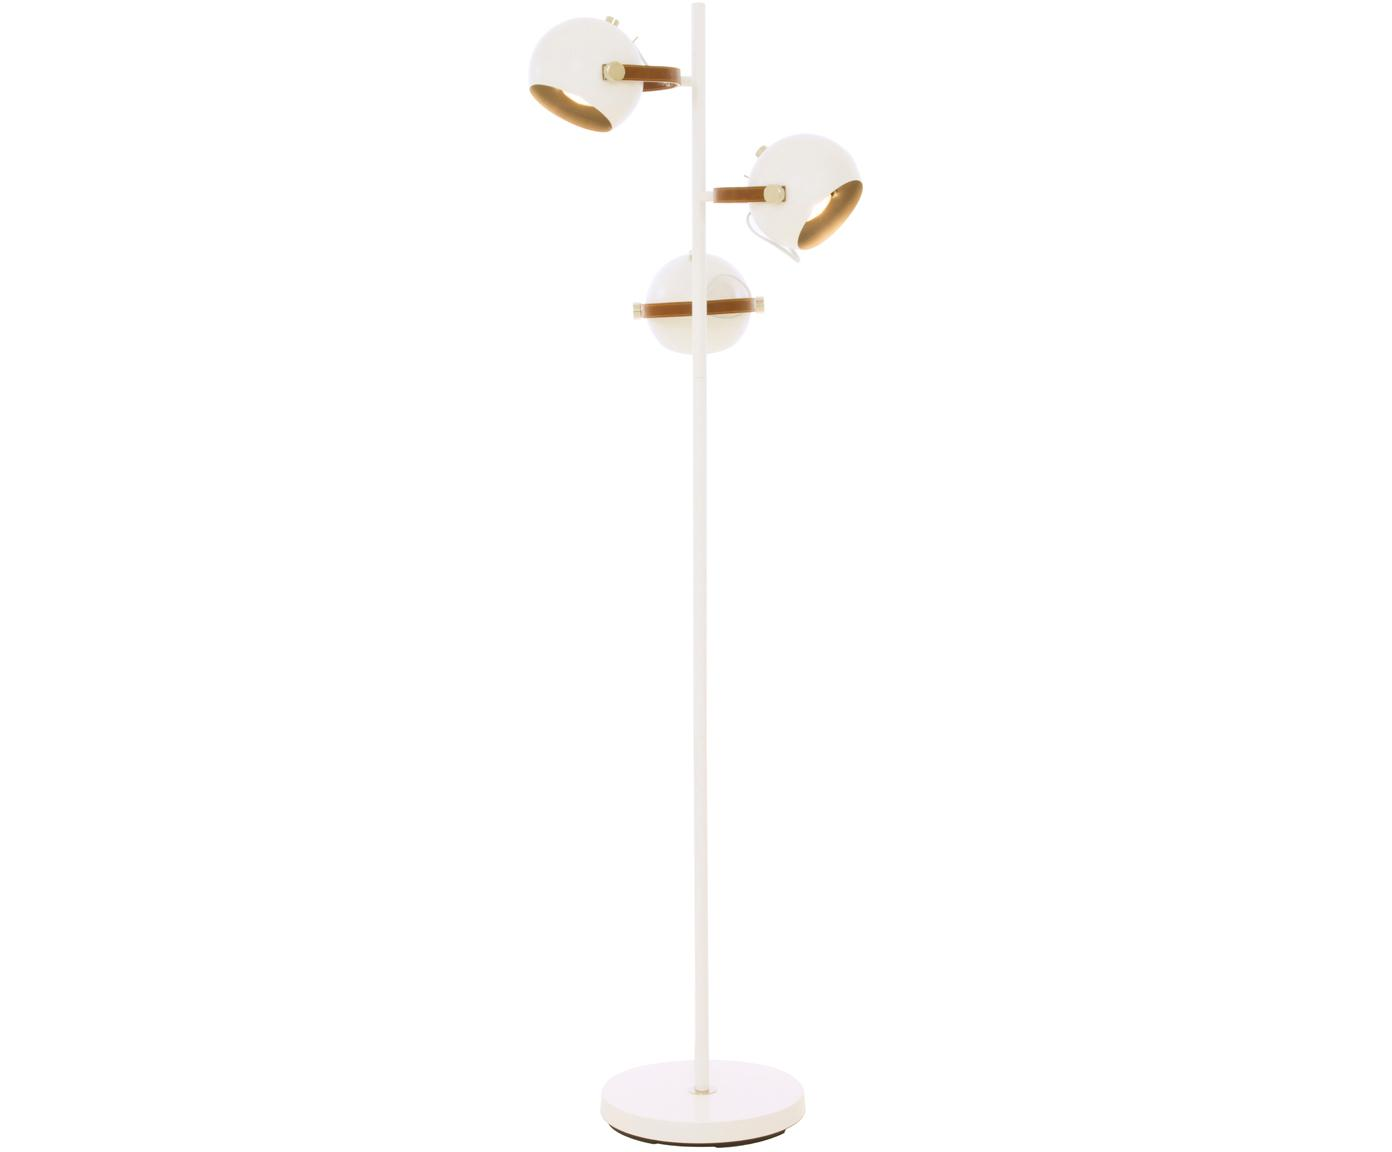 Vloerlamp Bow, Wit, bruin, 48 x 152 cm